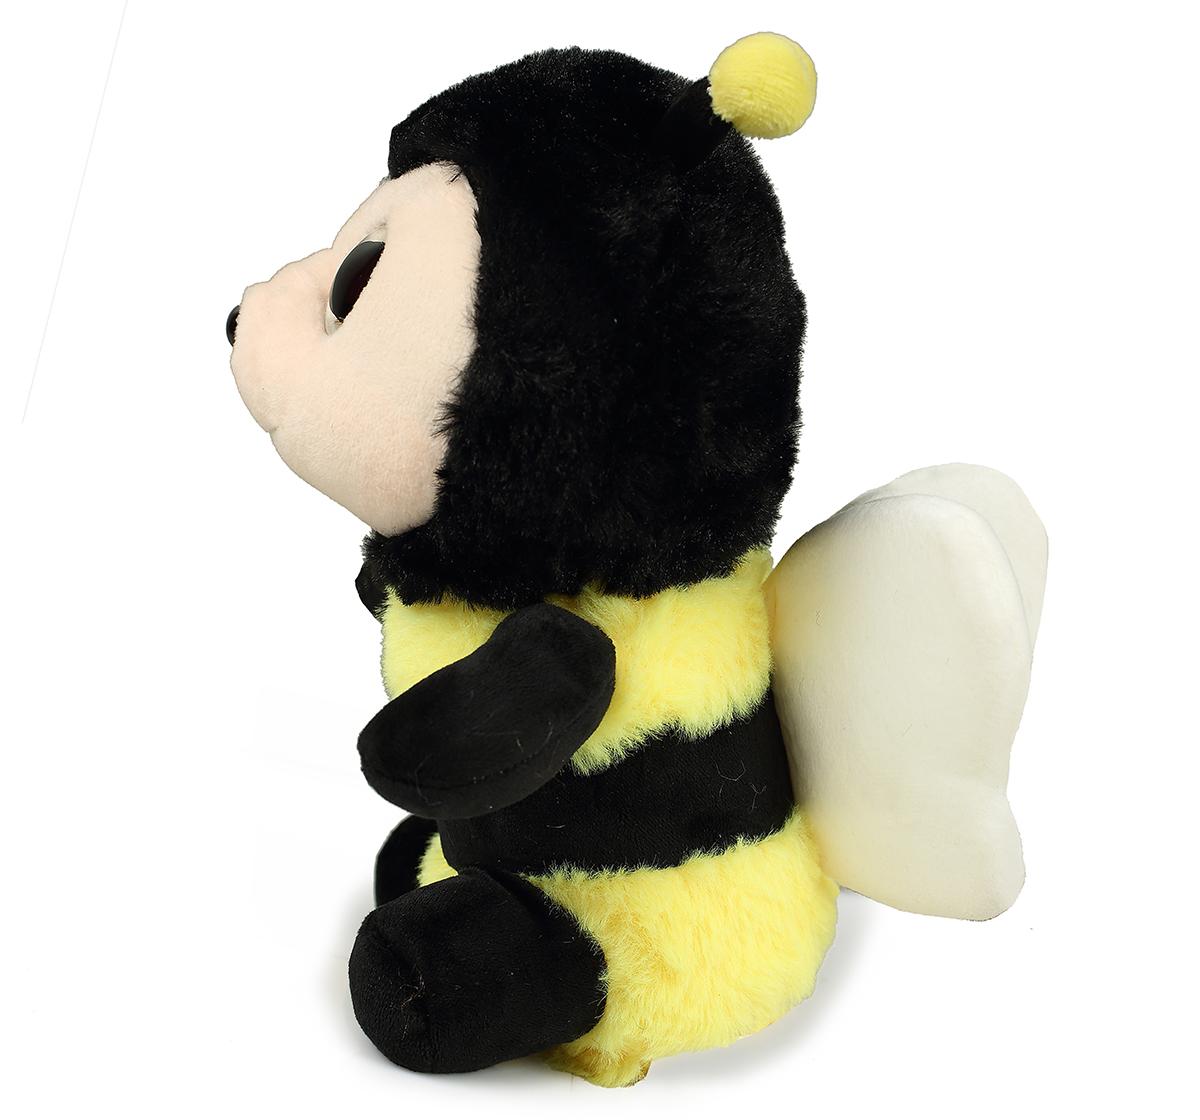 Soft Buddies | Soft Buddies Big Eyes Honeybee 20Cm, Unisex, 9M+ (Multicolor)